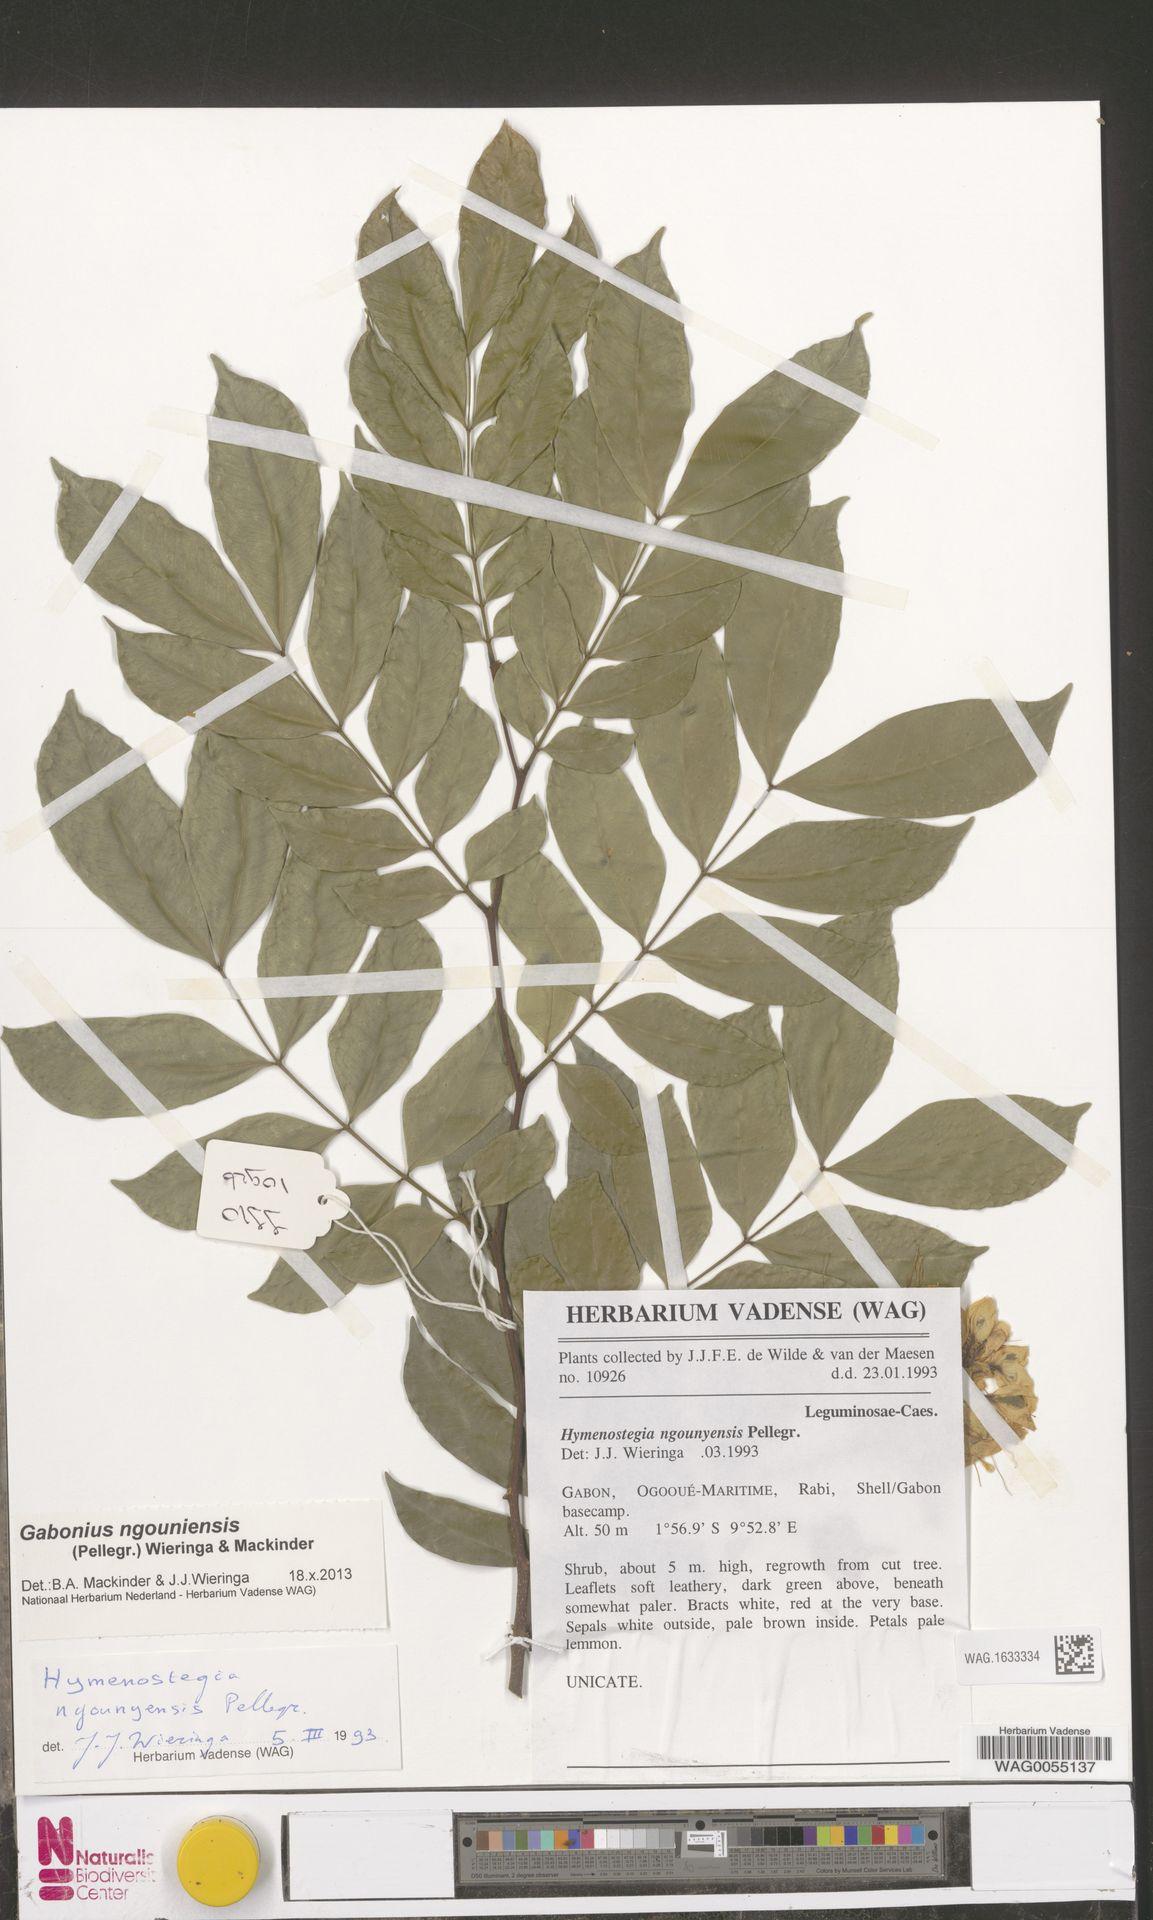 WAG.1633334 | Gabonius ngouniensis (Pellegr.) Wieringa & Mackinder